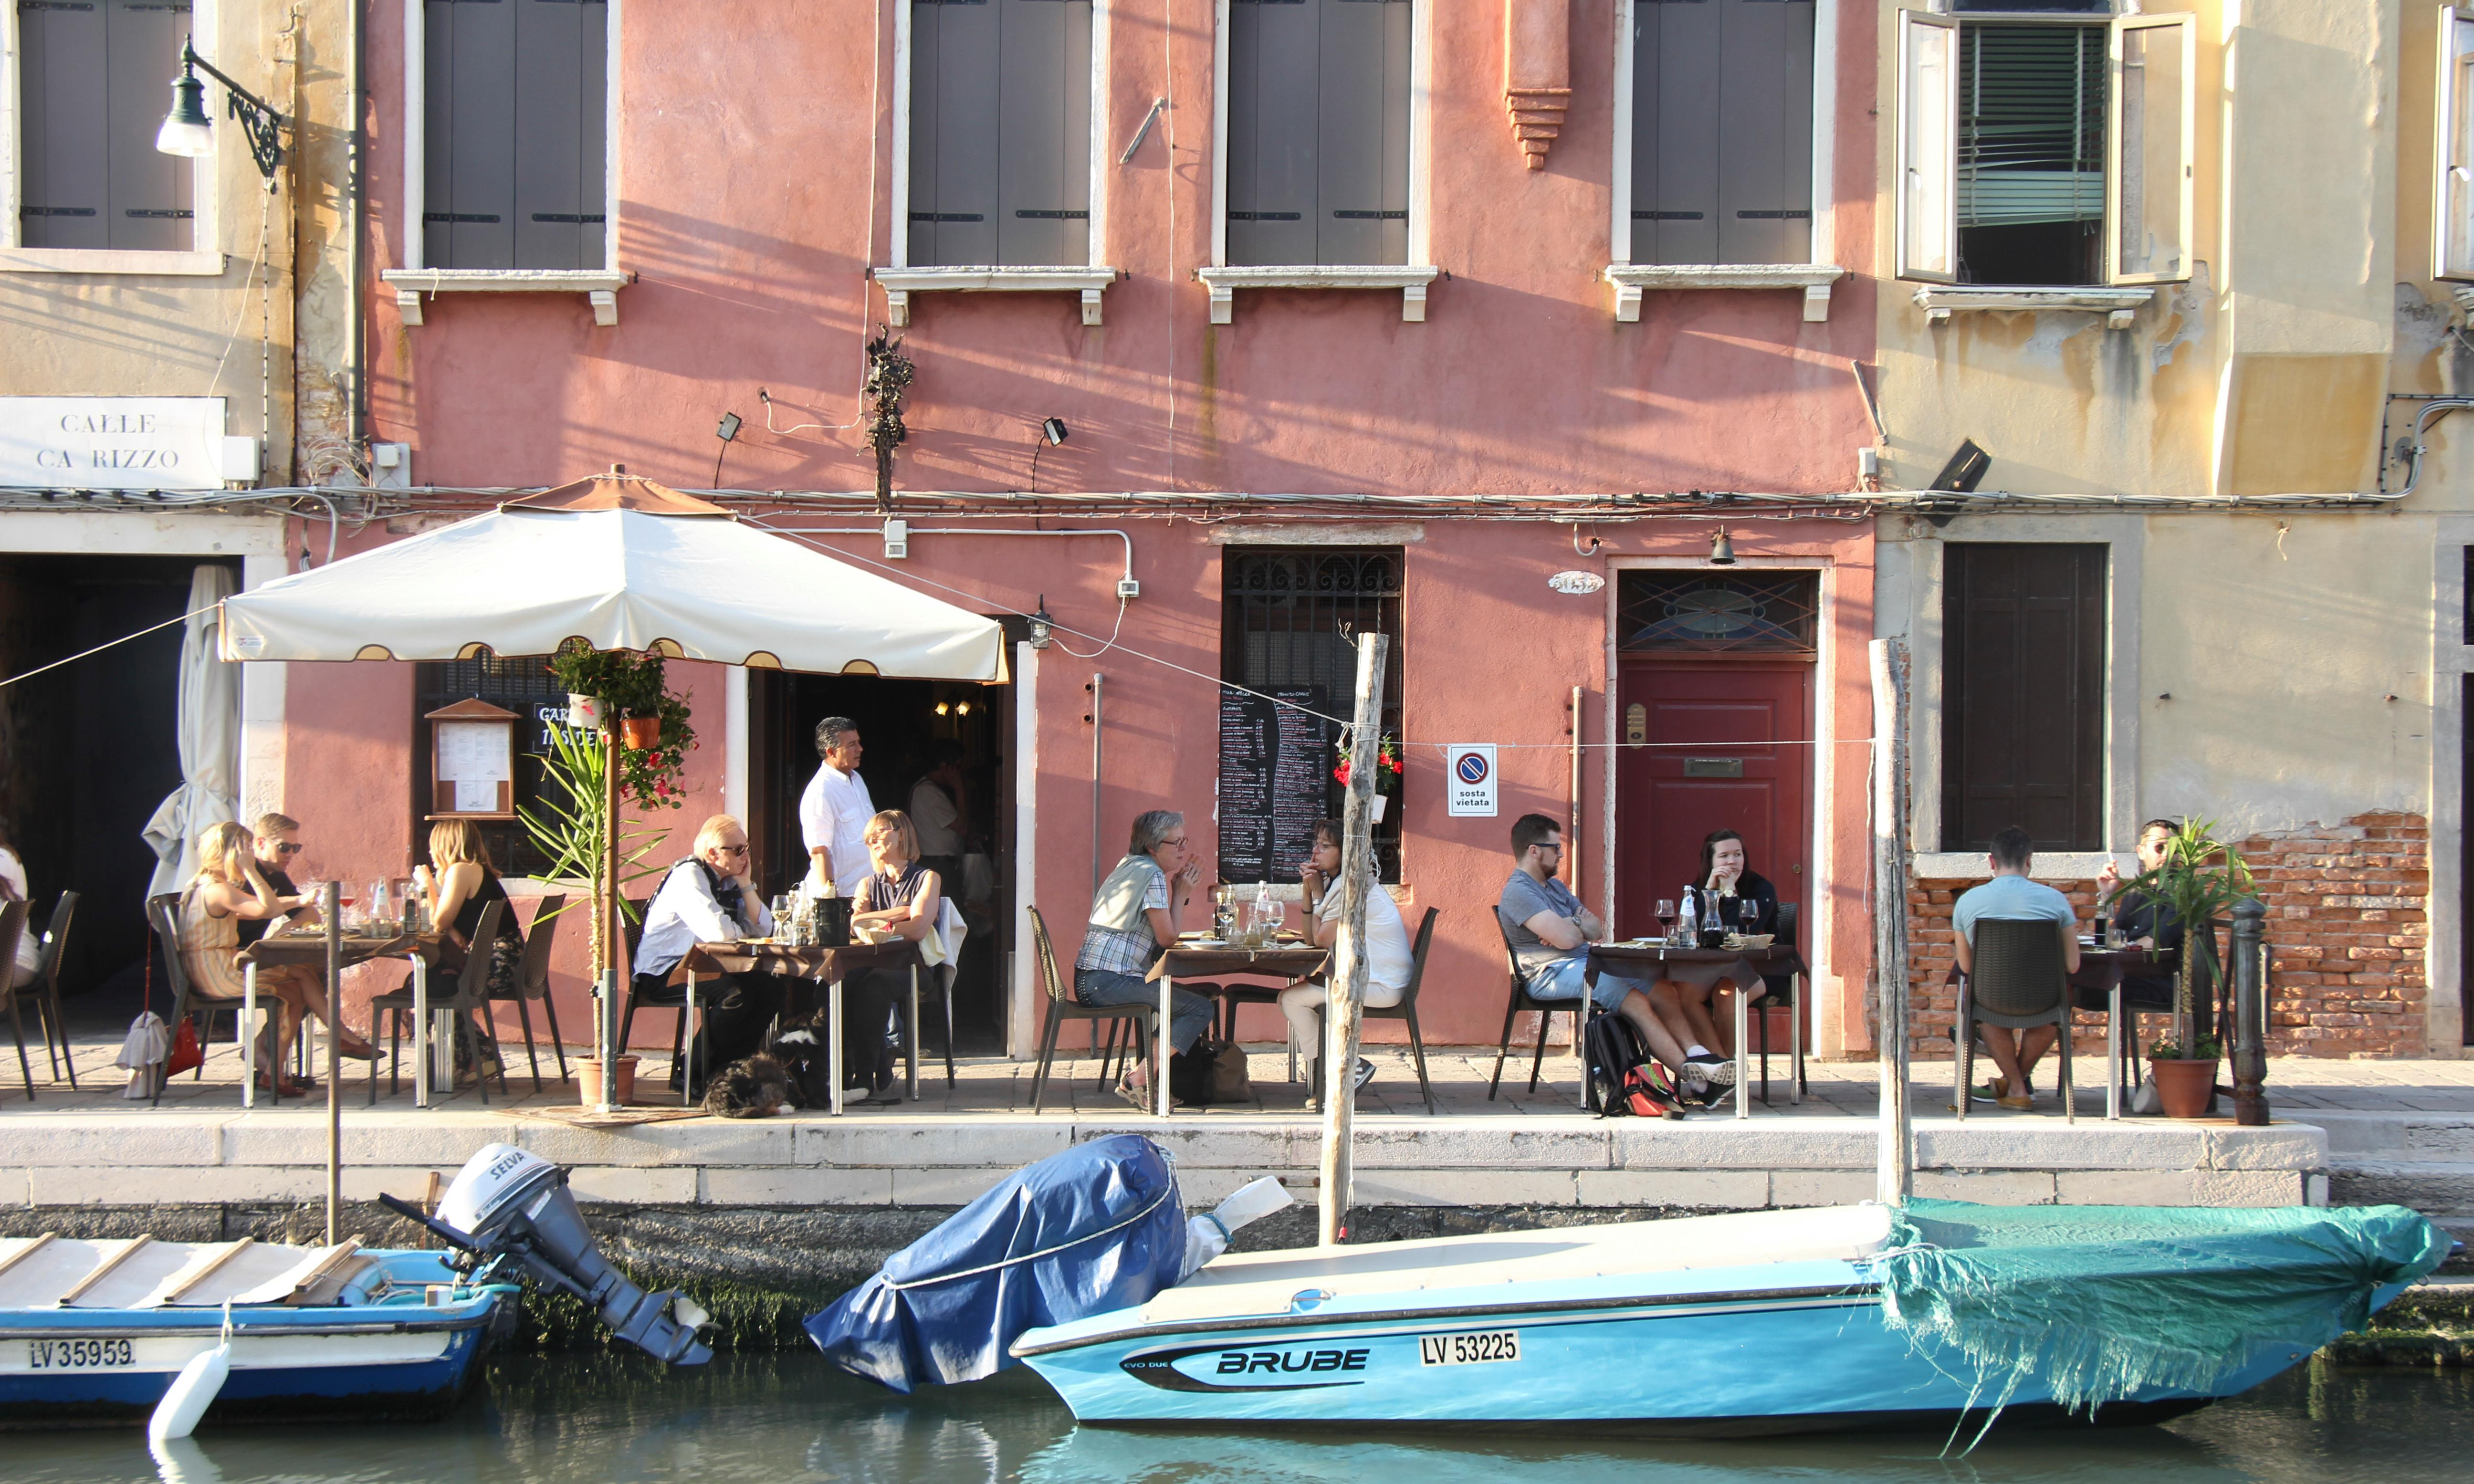 10 of the best restaurants near Venice's major attractions